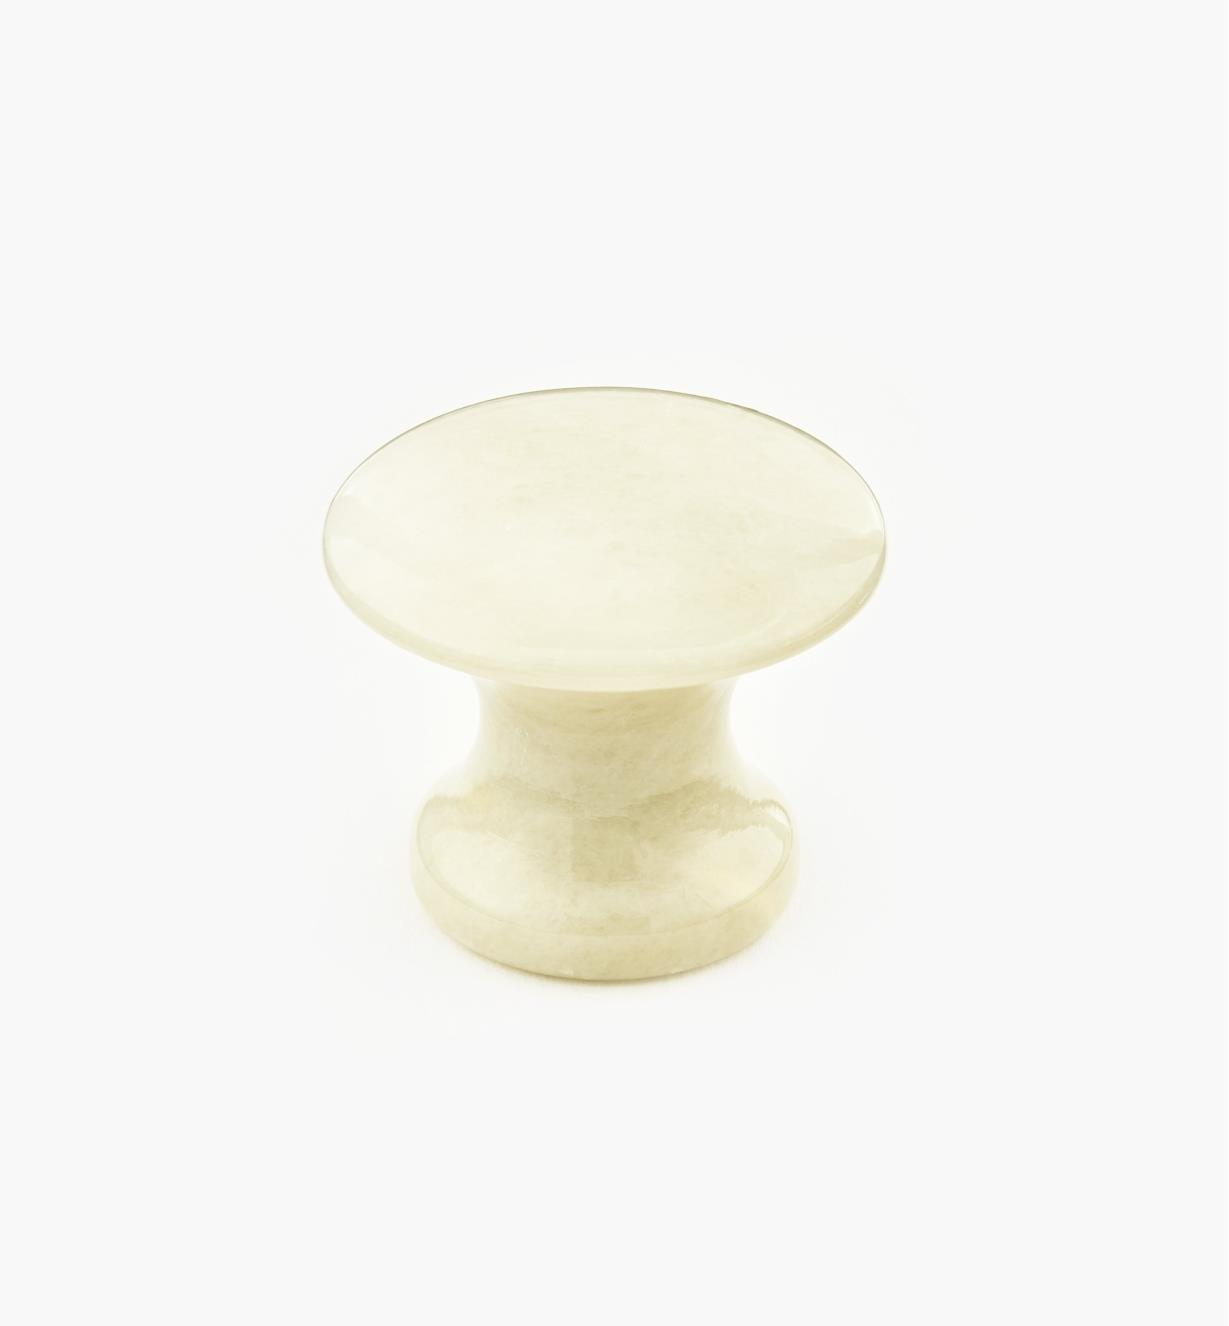 00W4064 - Bouton en marbre, blanc, 35 mm x 30 mm